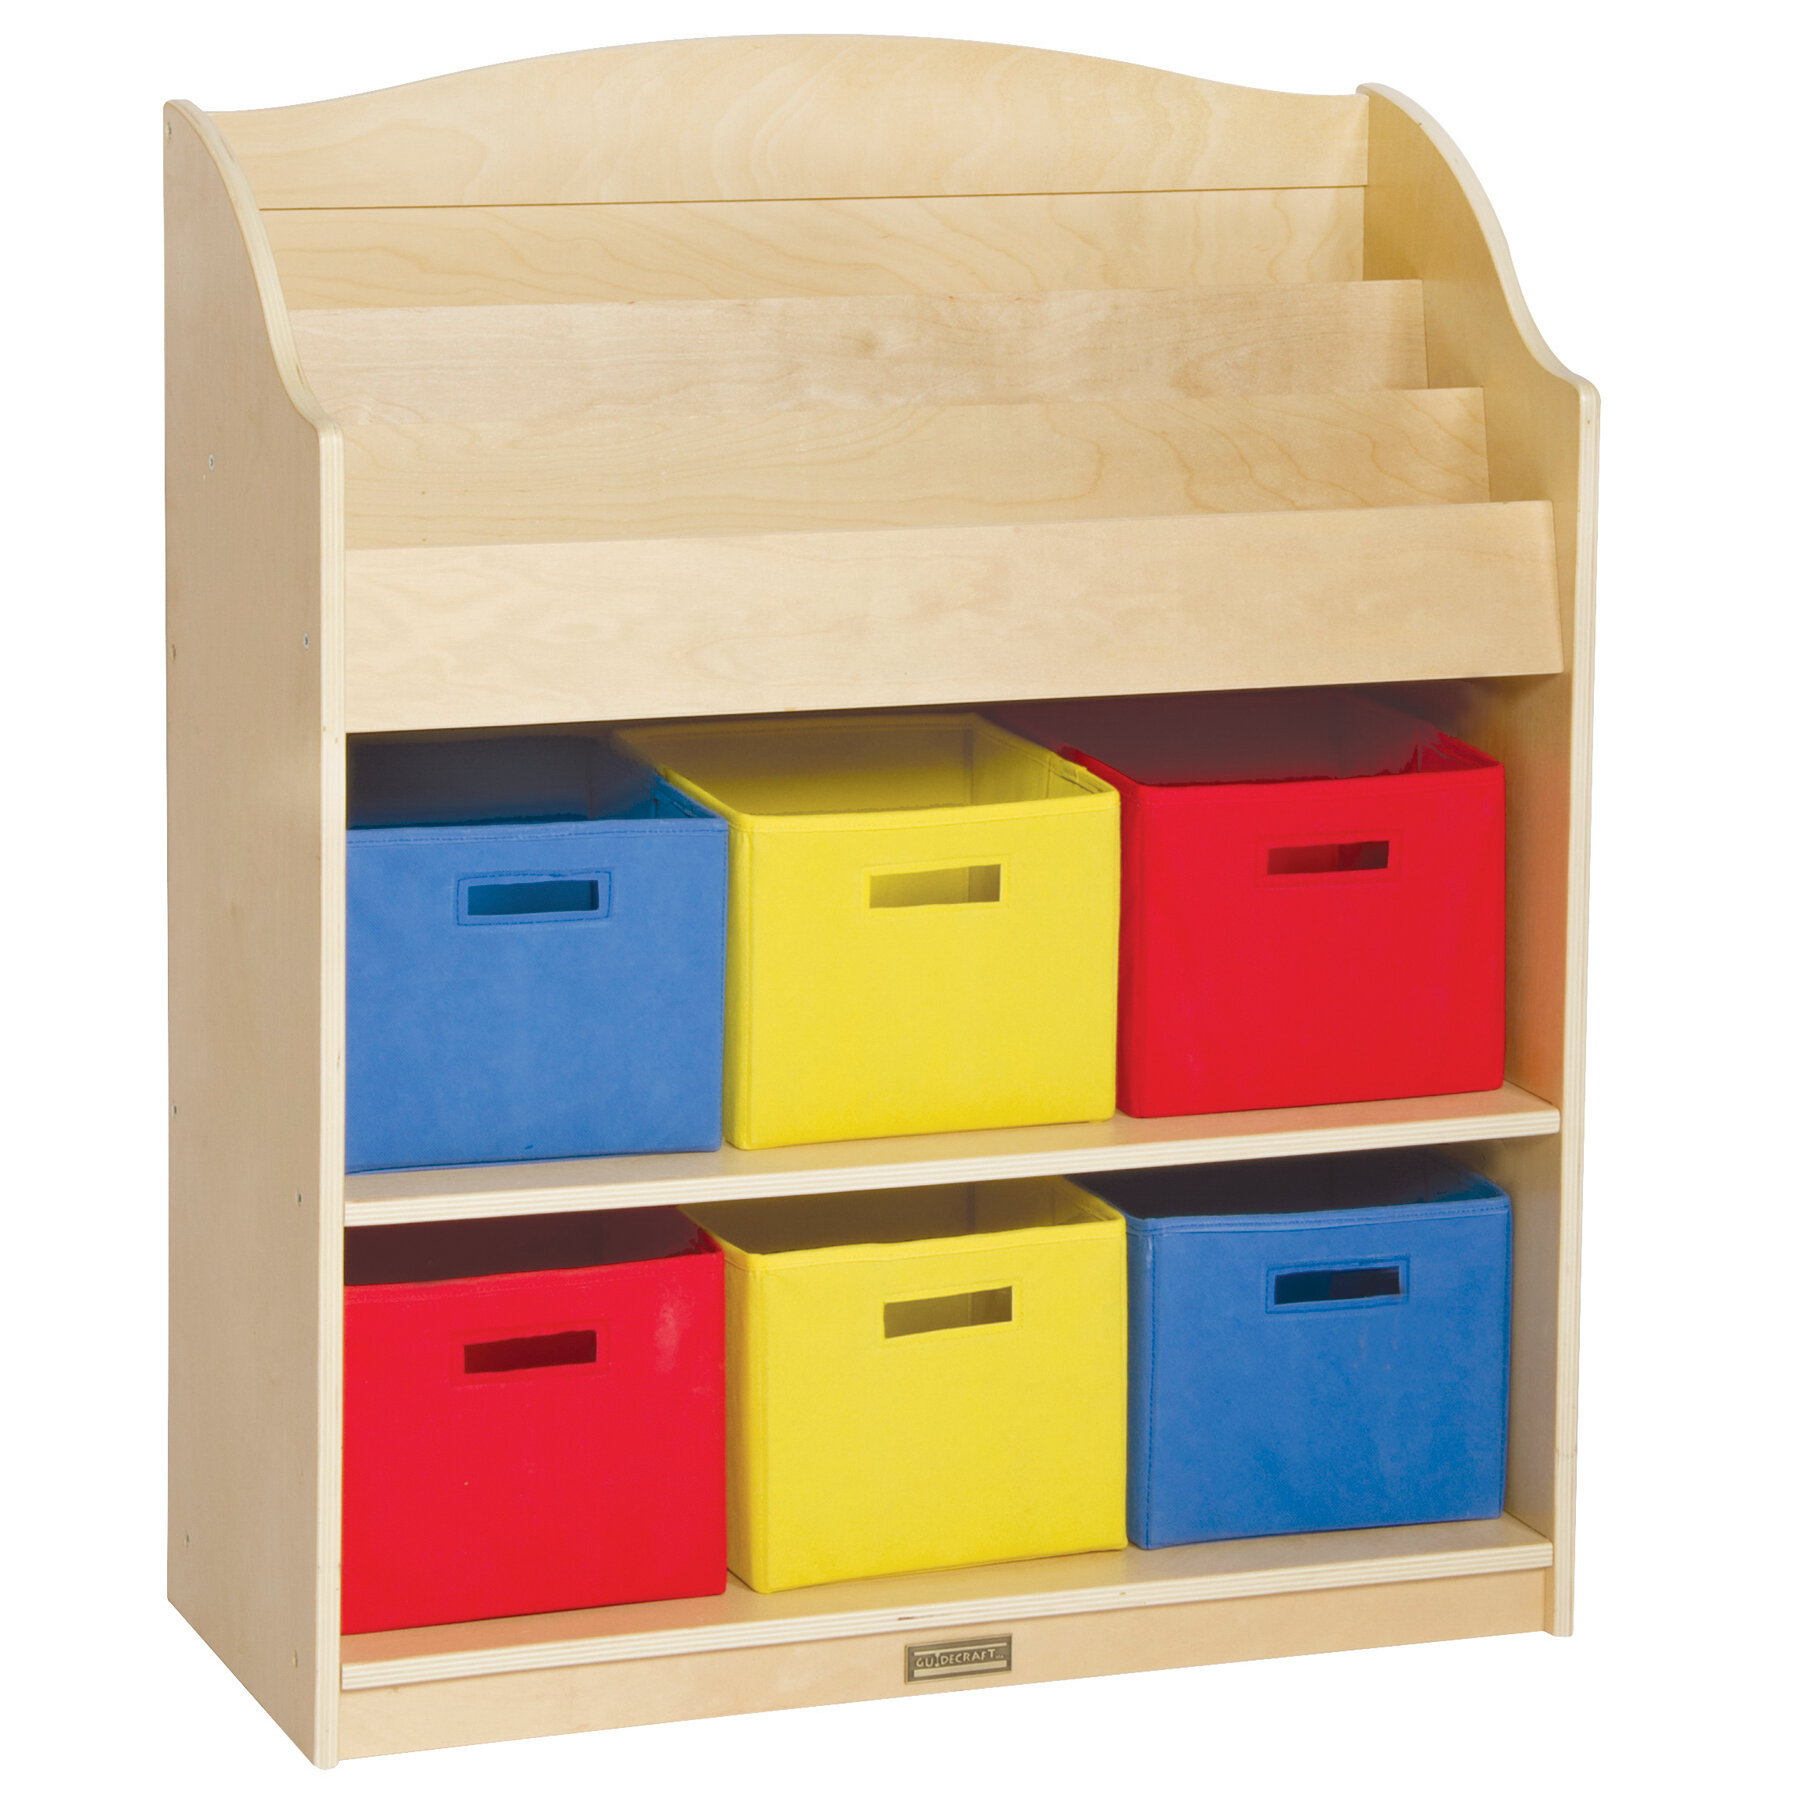 Fine Classroom Shelves Youll Love In 2019 Wayfair Home Interior And Landscaping Spoatsignezvosmurscom